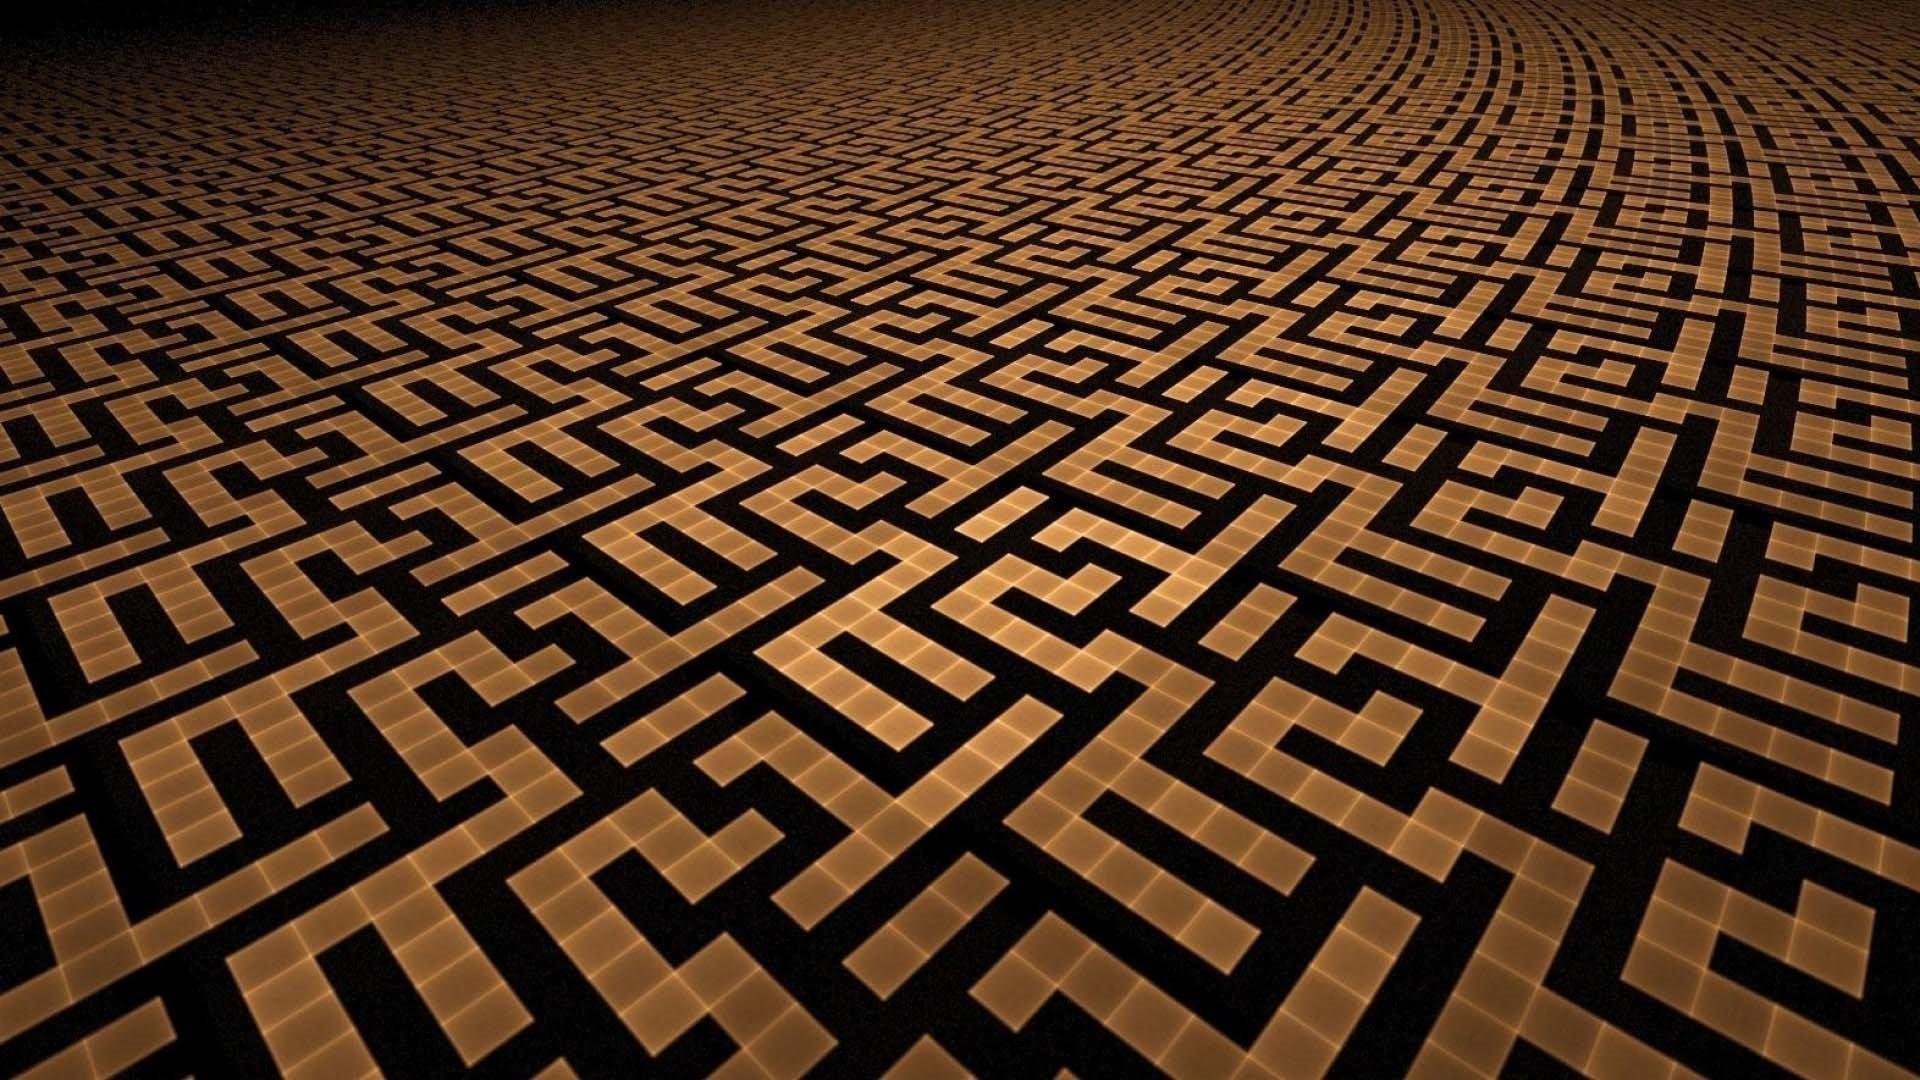 Labyrinth Wallpaper Download Full